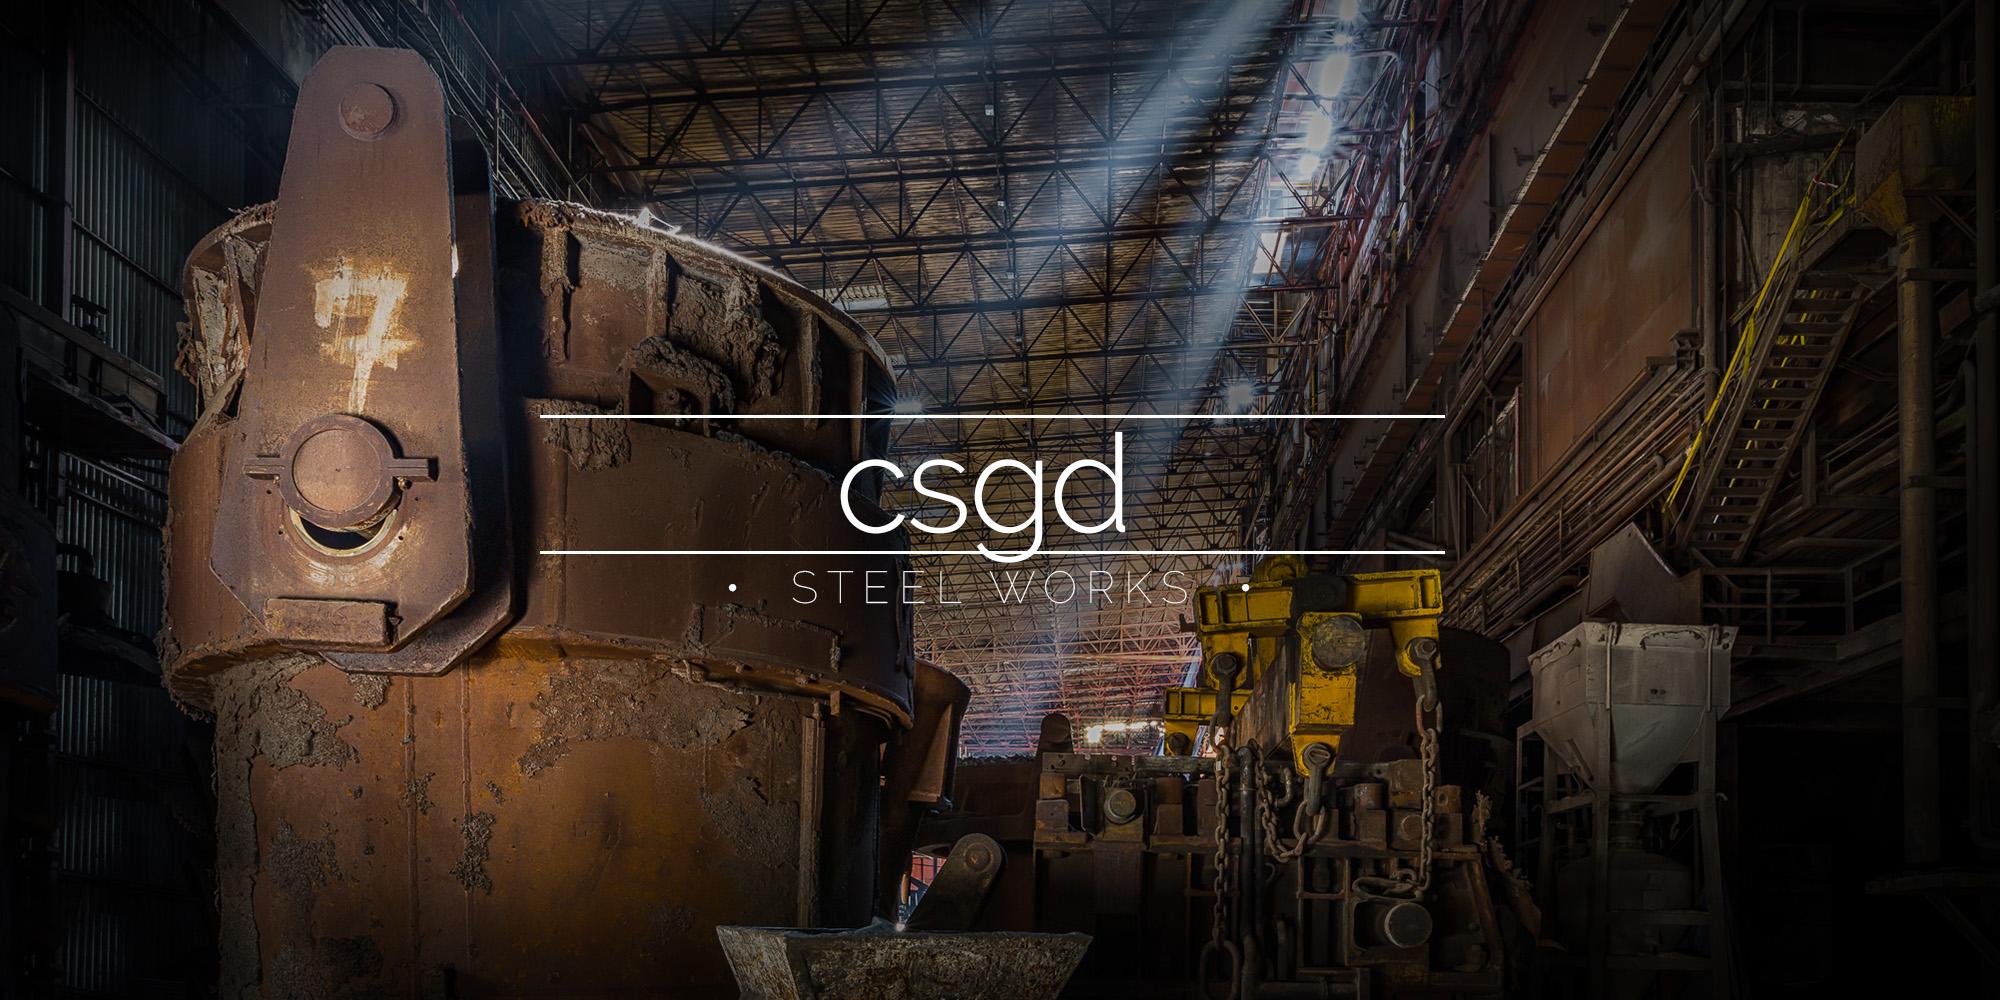 CSGD Steel Works, Belgium